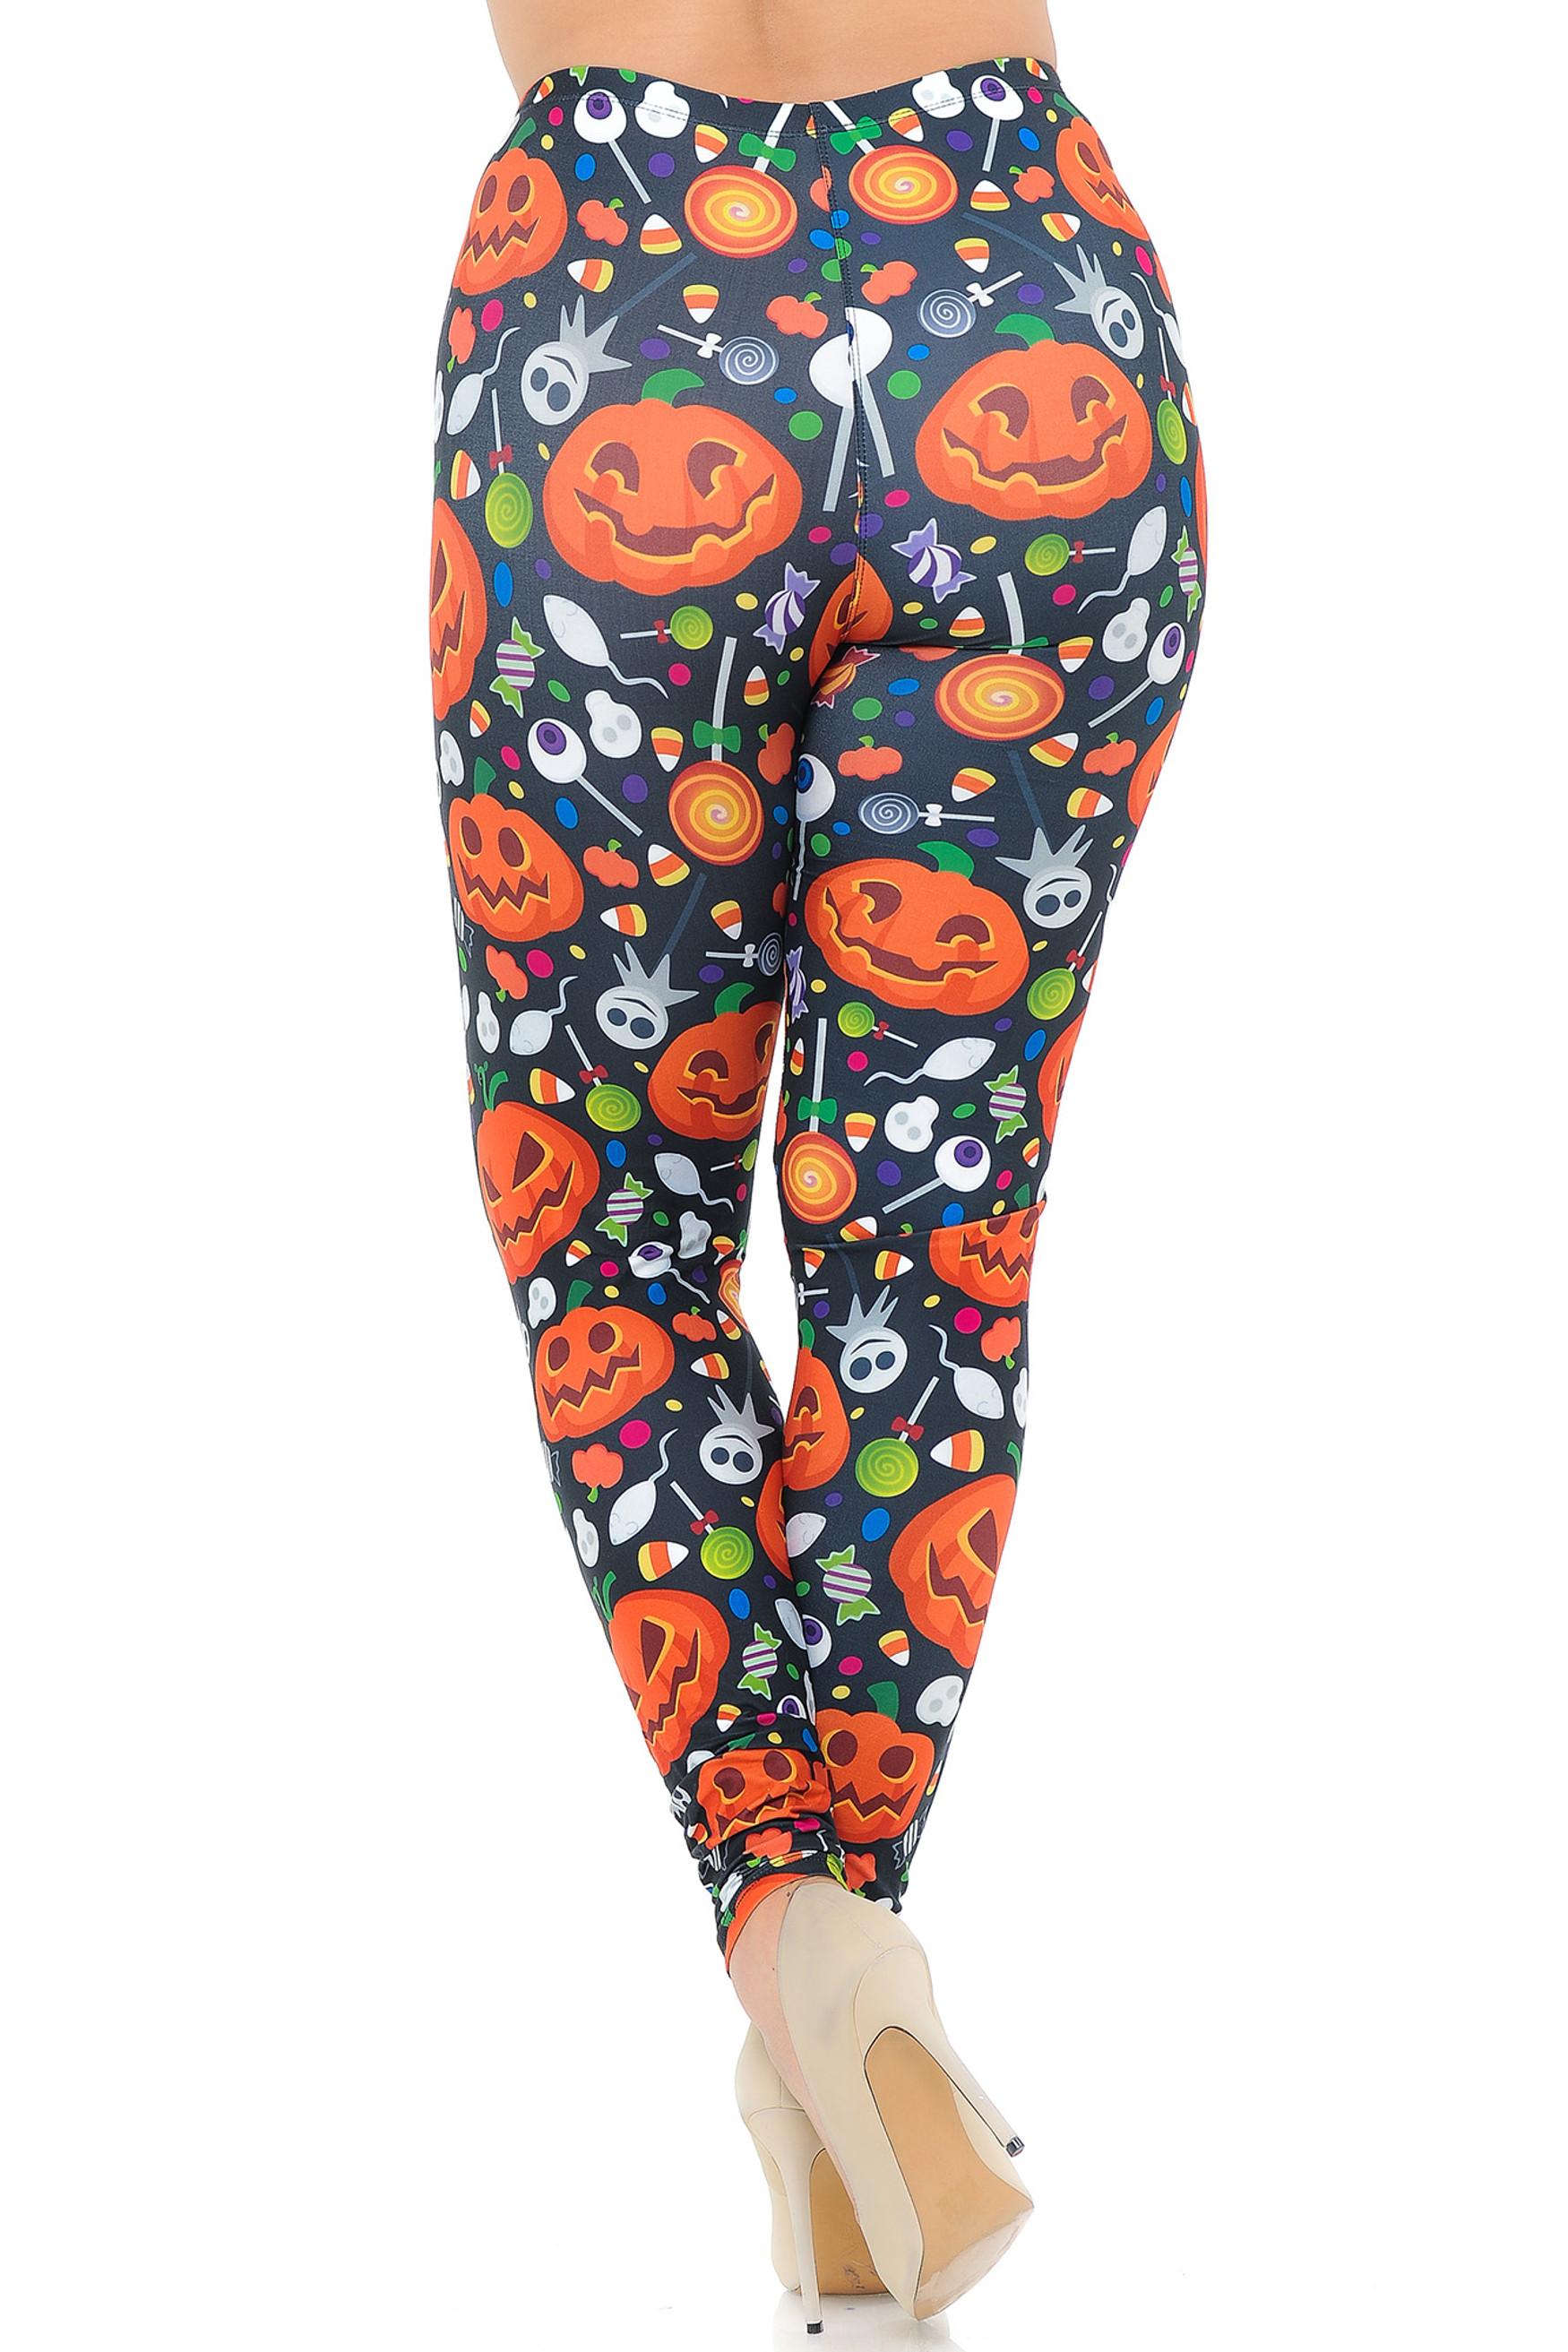 Creamy Soft Pumpkins and Halloween Candy Plus Size Leggings - USA Fashion™